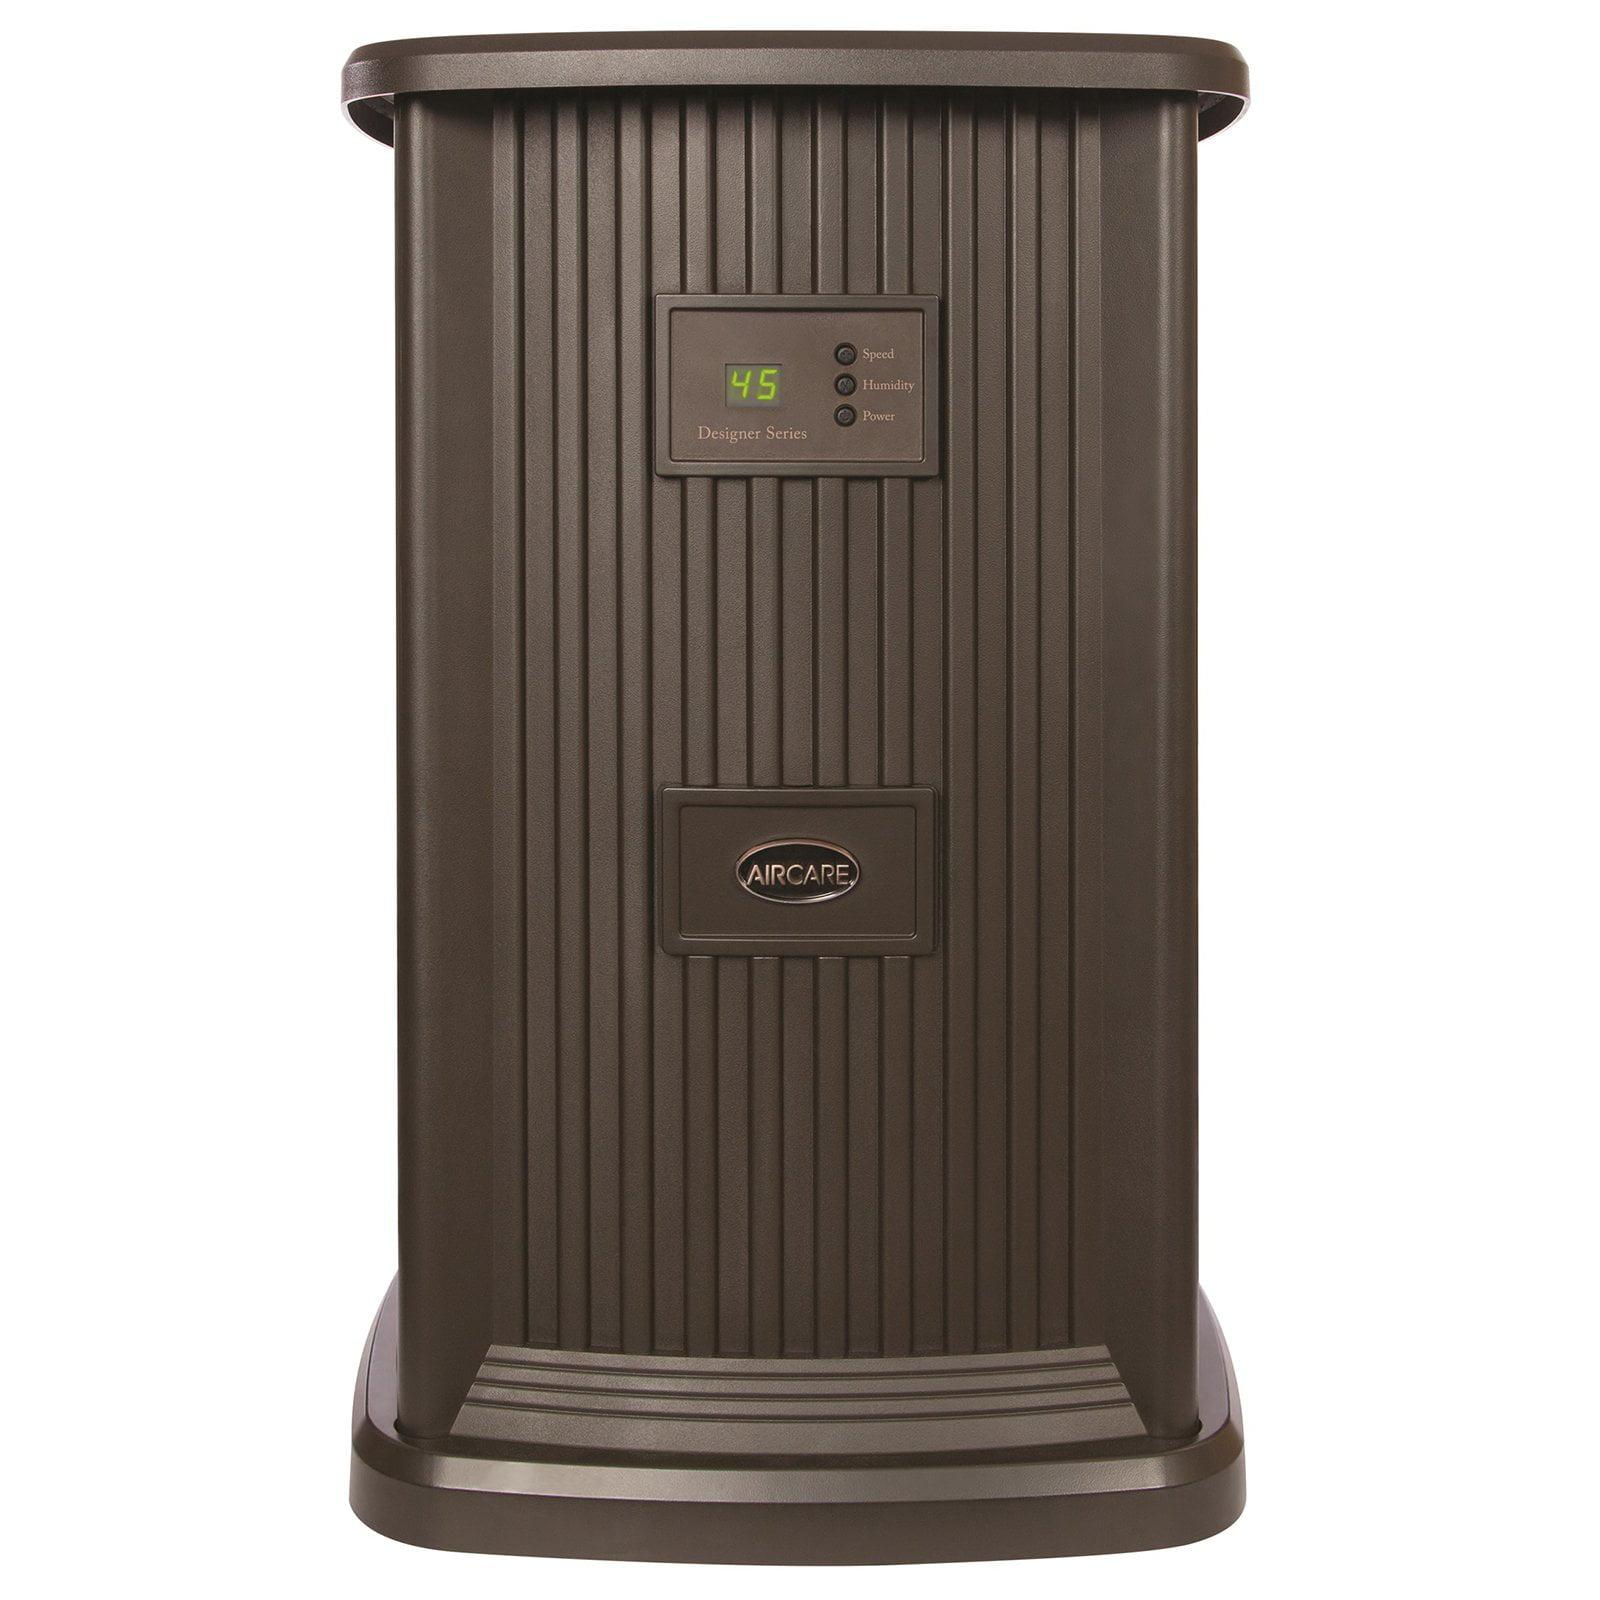 AIRCARE EP9800 Evaporative Pedestal Humidifier by Essick Air